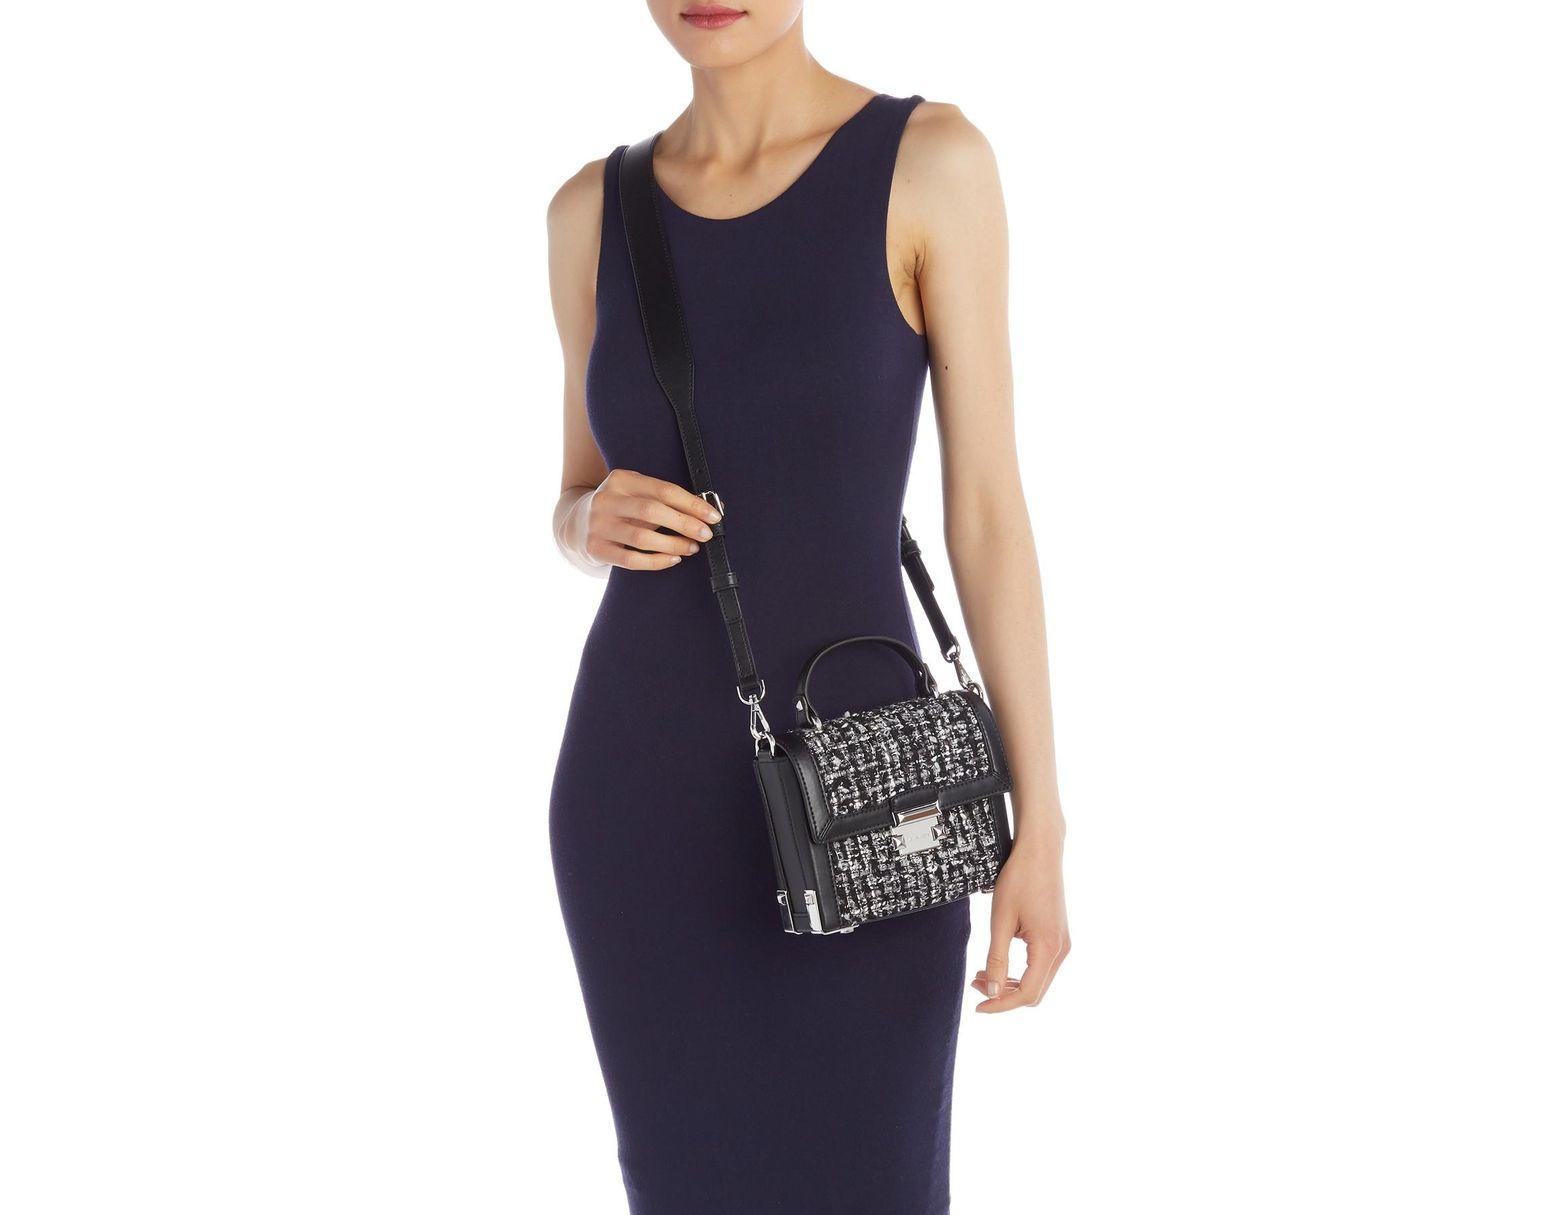 b793ce5195a8 MICHAEL Michael Kors Jayne Small Tweed Trunk Shoulder Bag in Black - Save  31% - Lyst